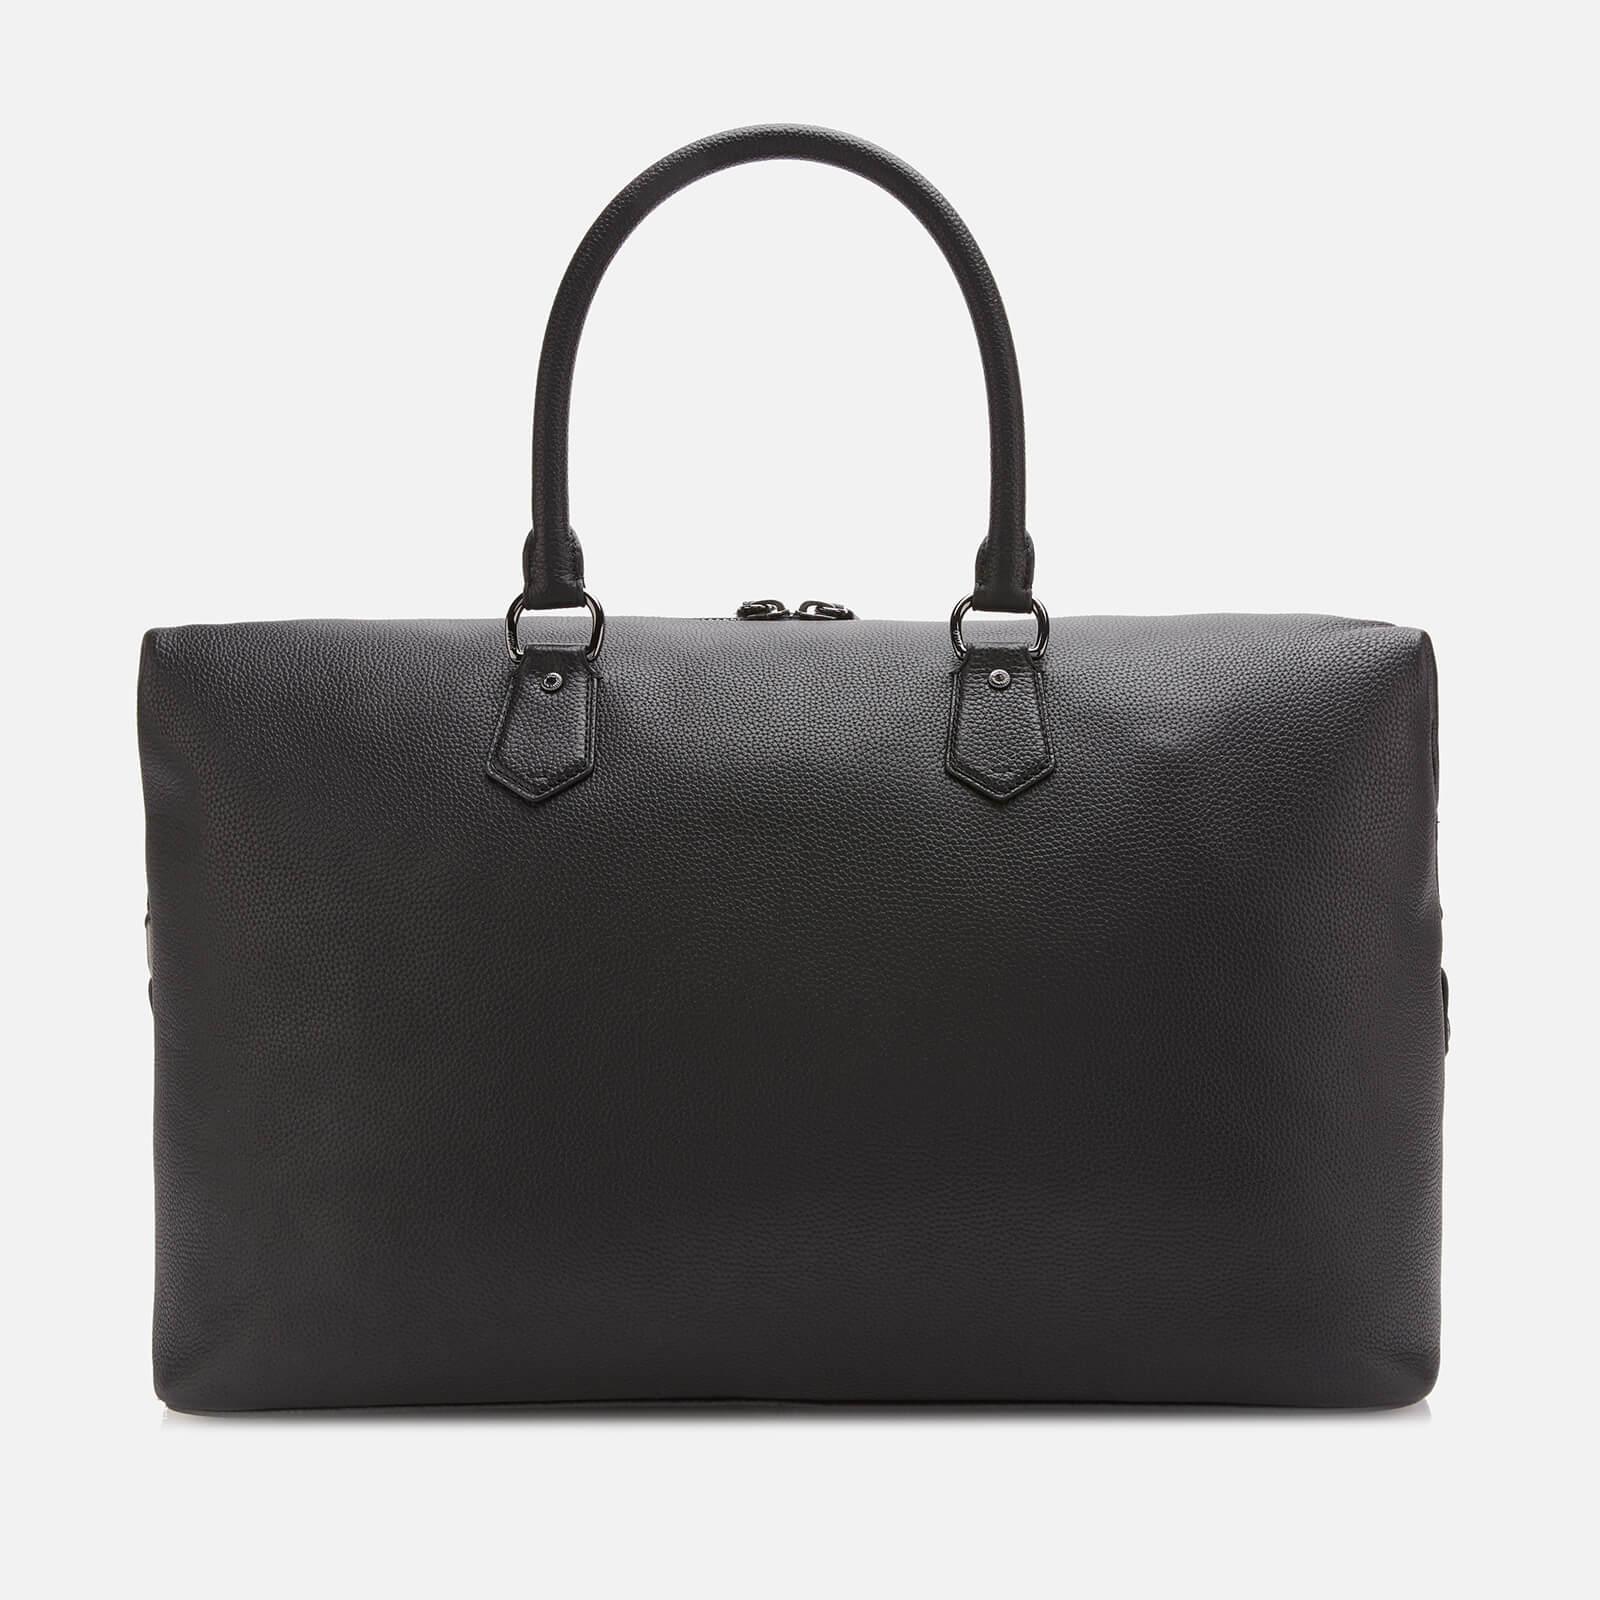 52b9a2aa8d5 Polo Ralph Lauren - Black Web Strap Pebble Duffle Bag for Men - Lyst. View  fullscreen